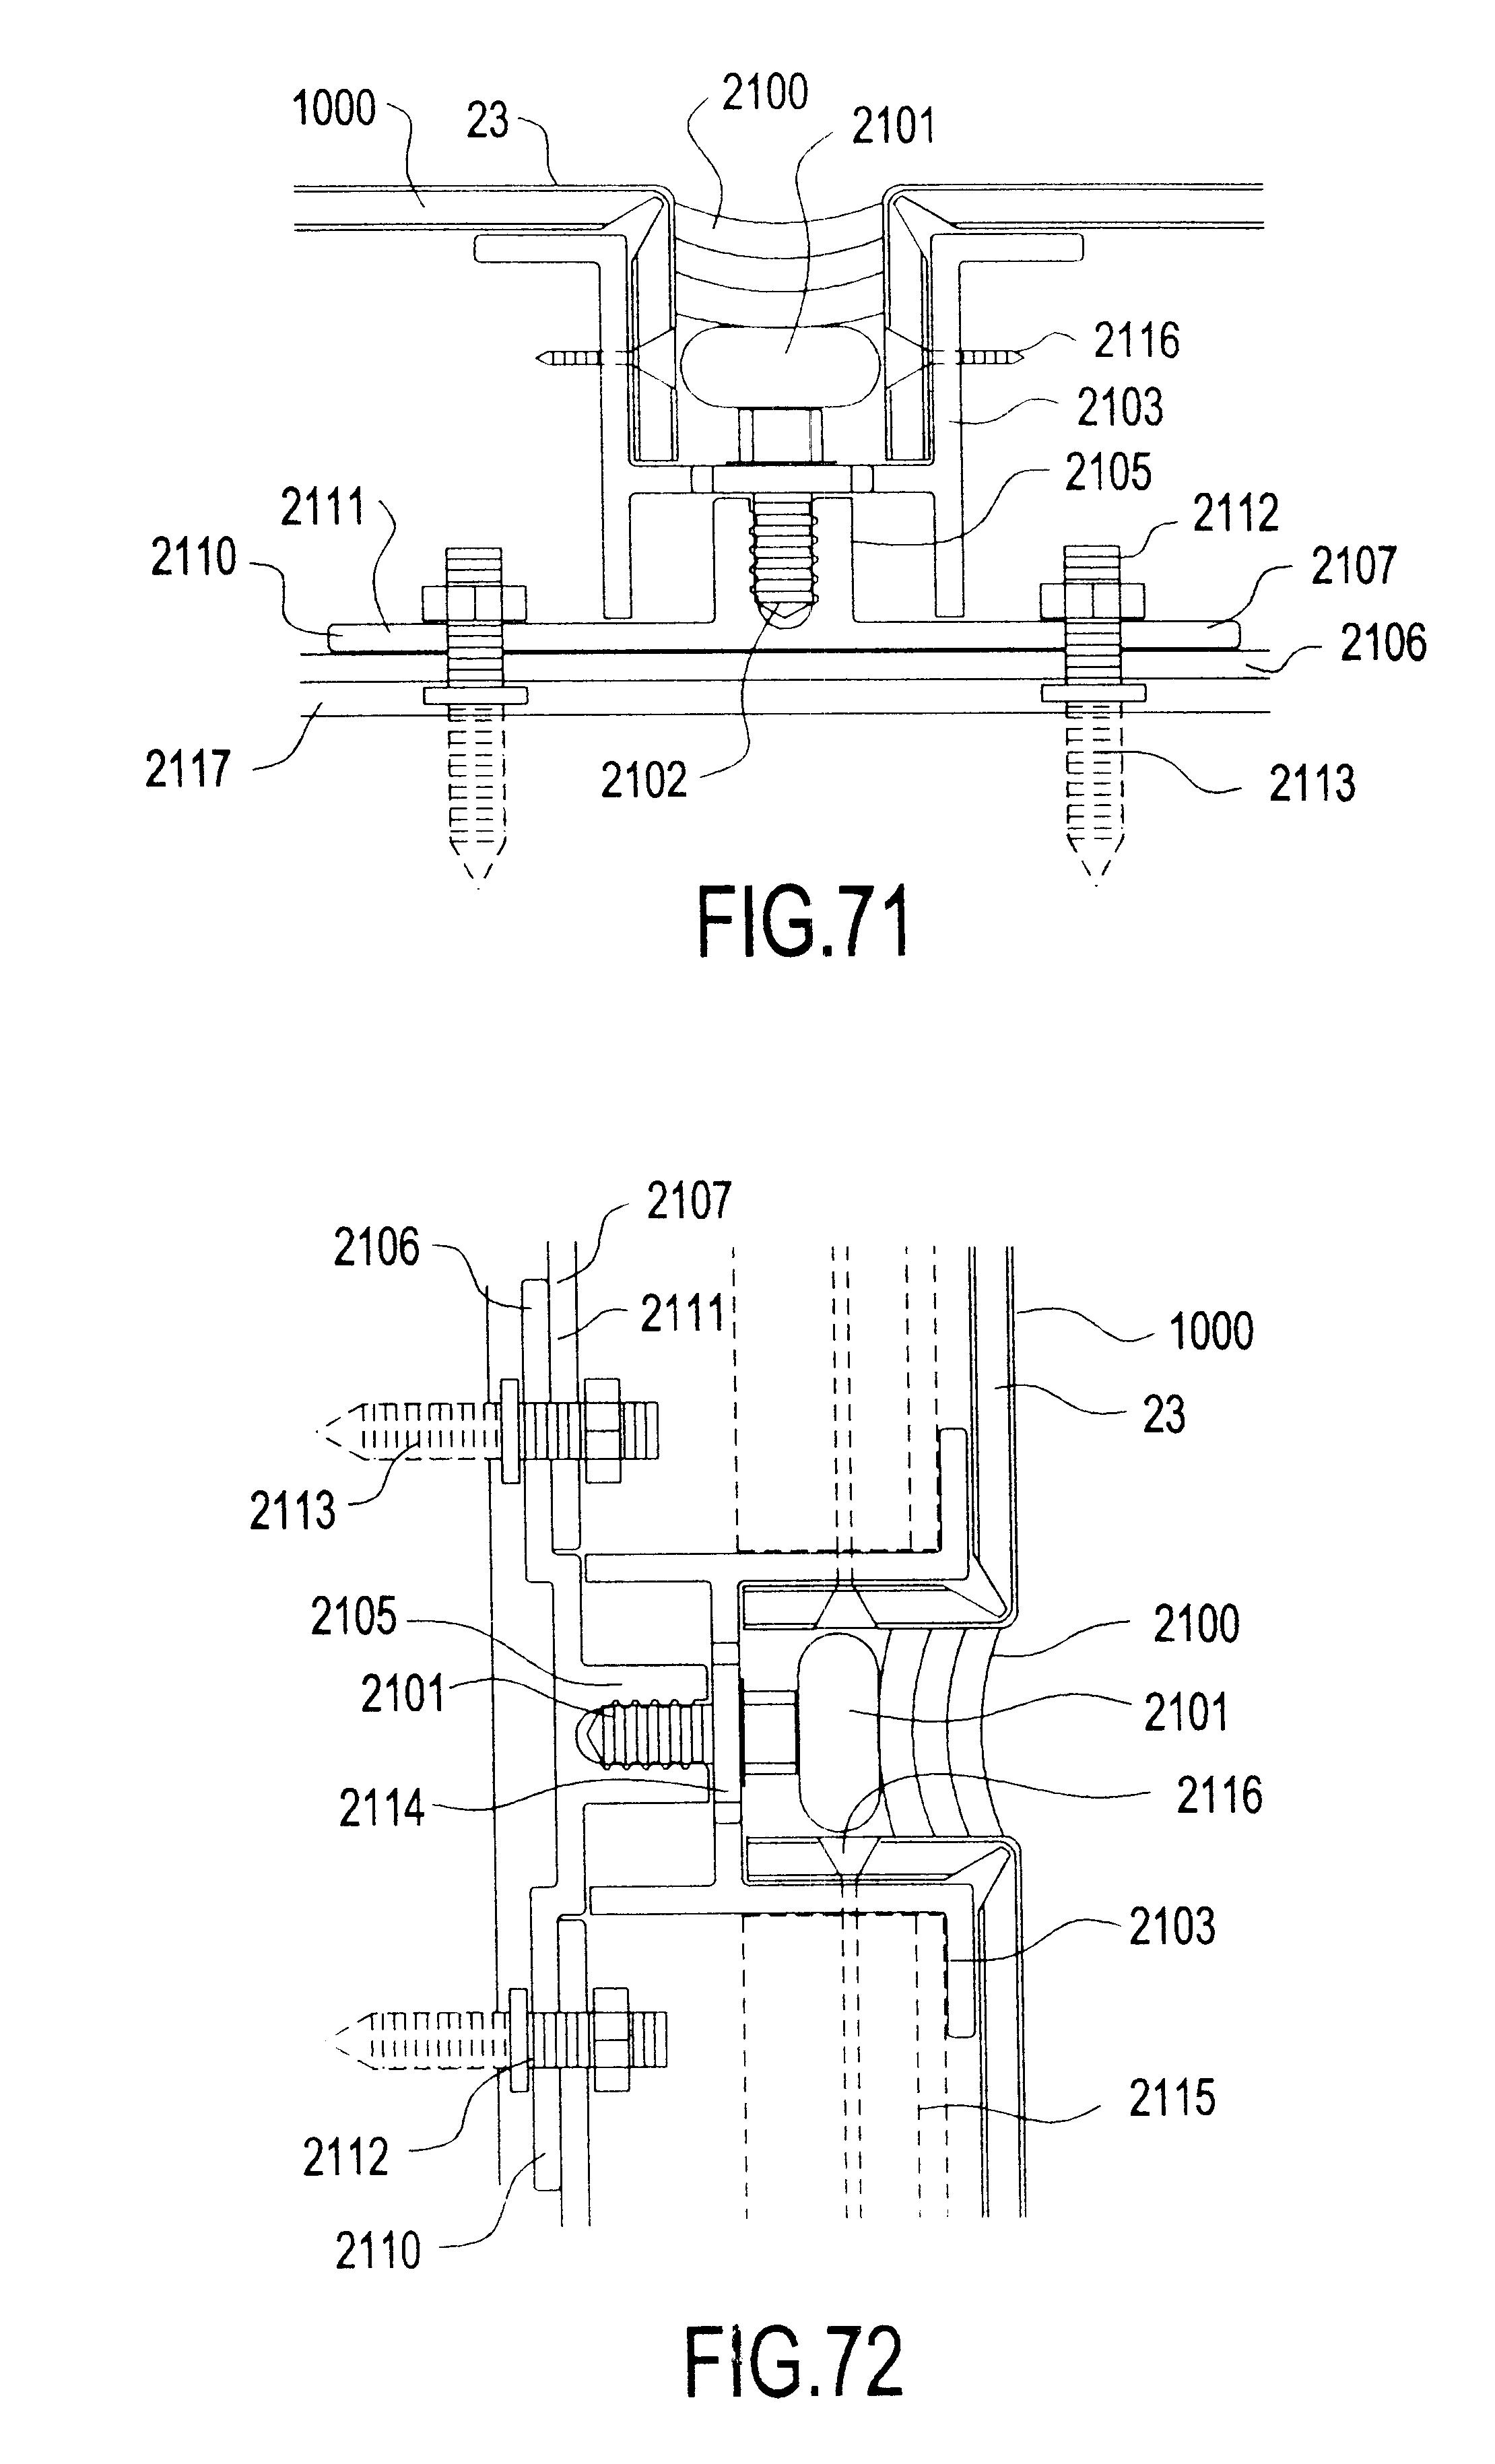 Fiber Optic Metal Patch Panels